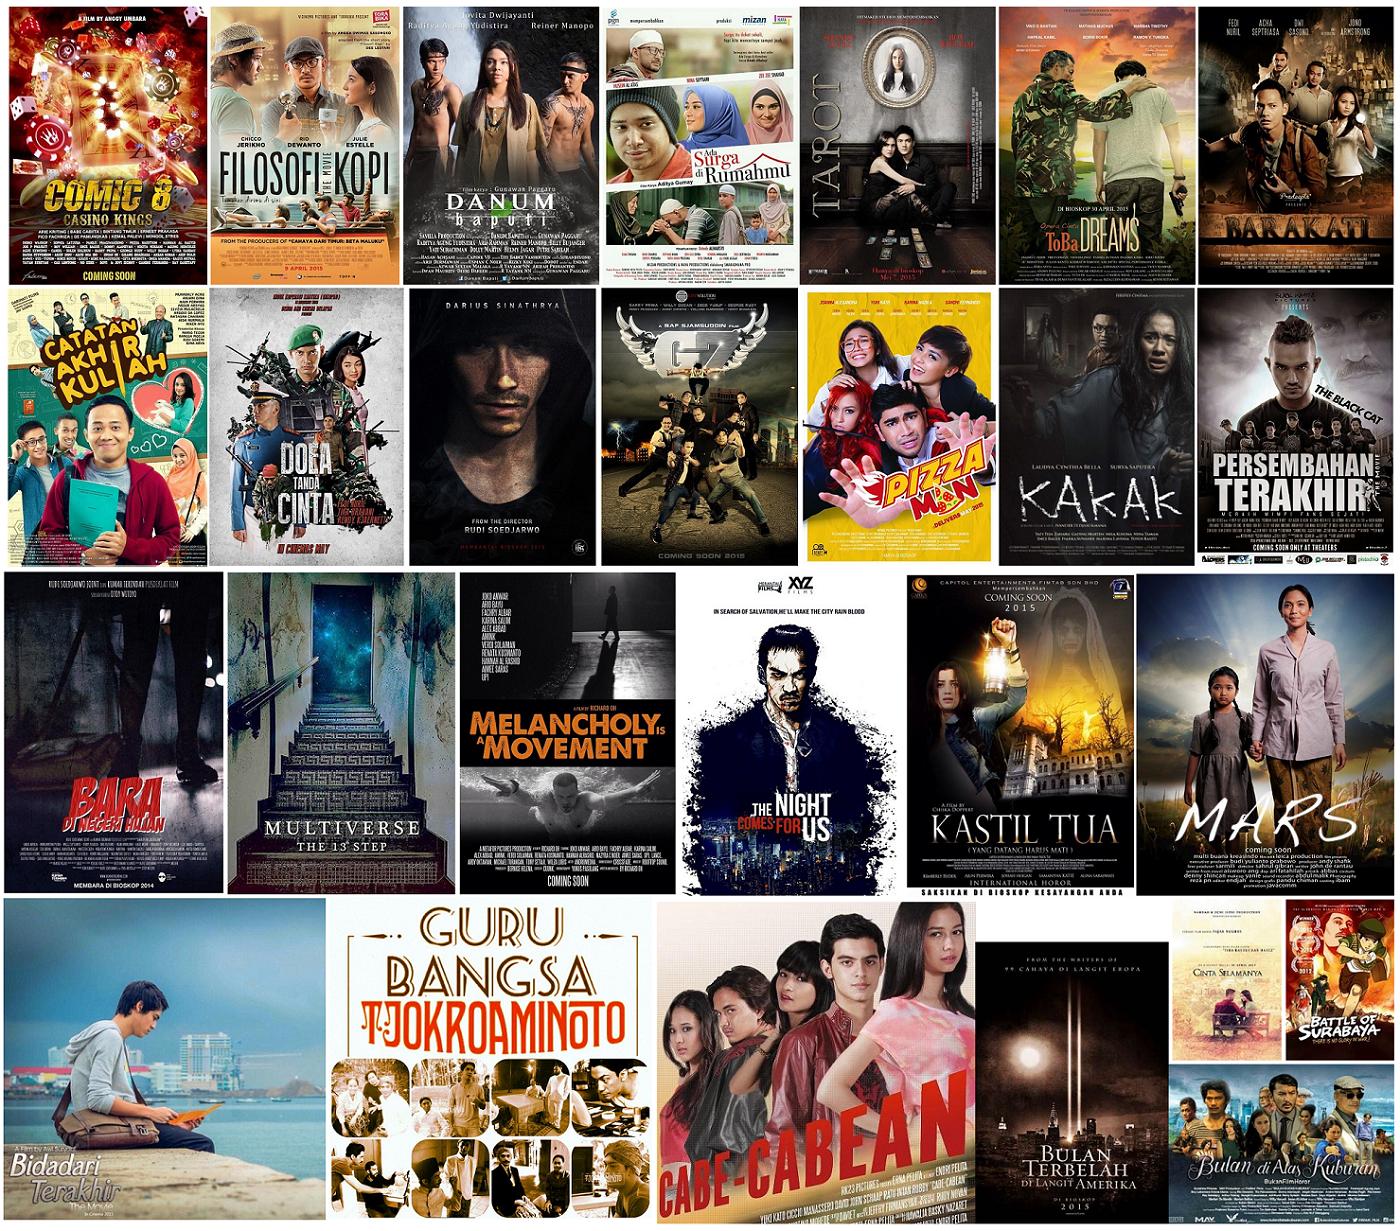 daftar nama film horor komedi indonesia daftar film horor